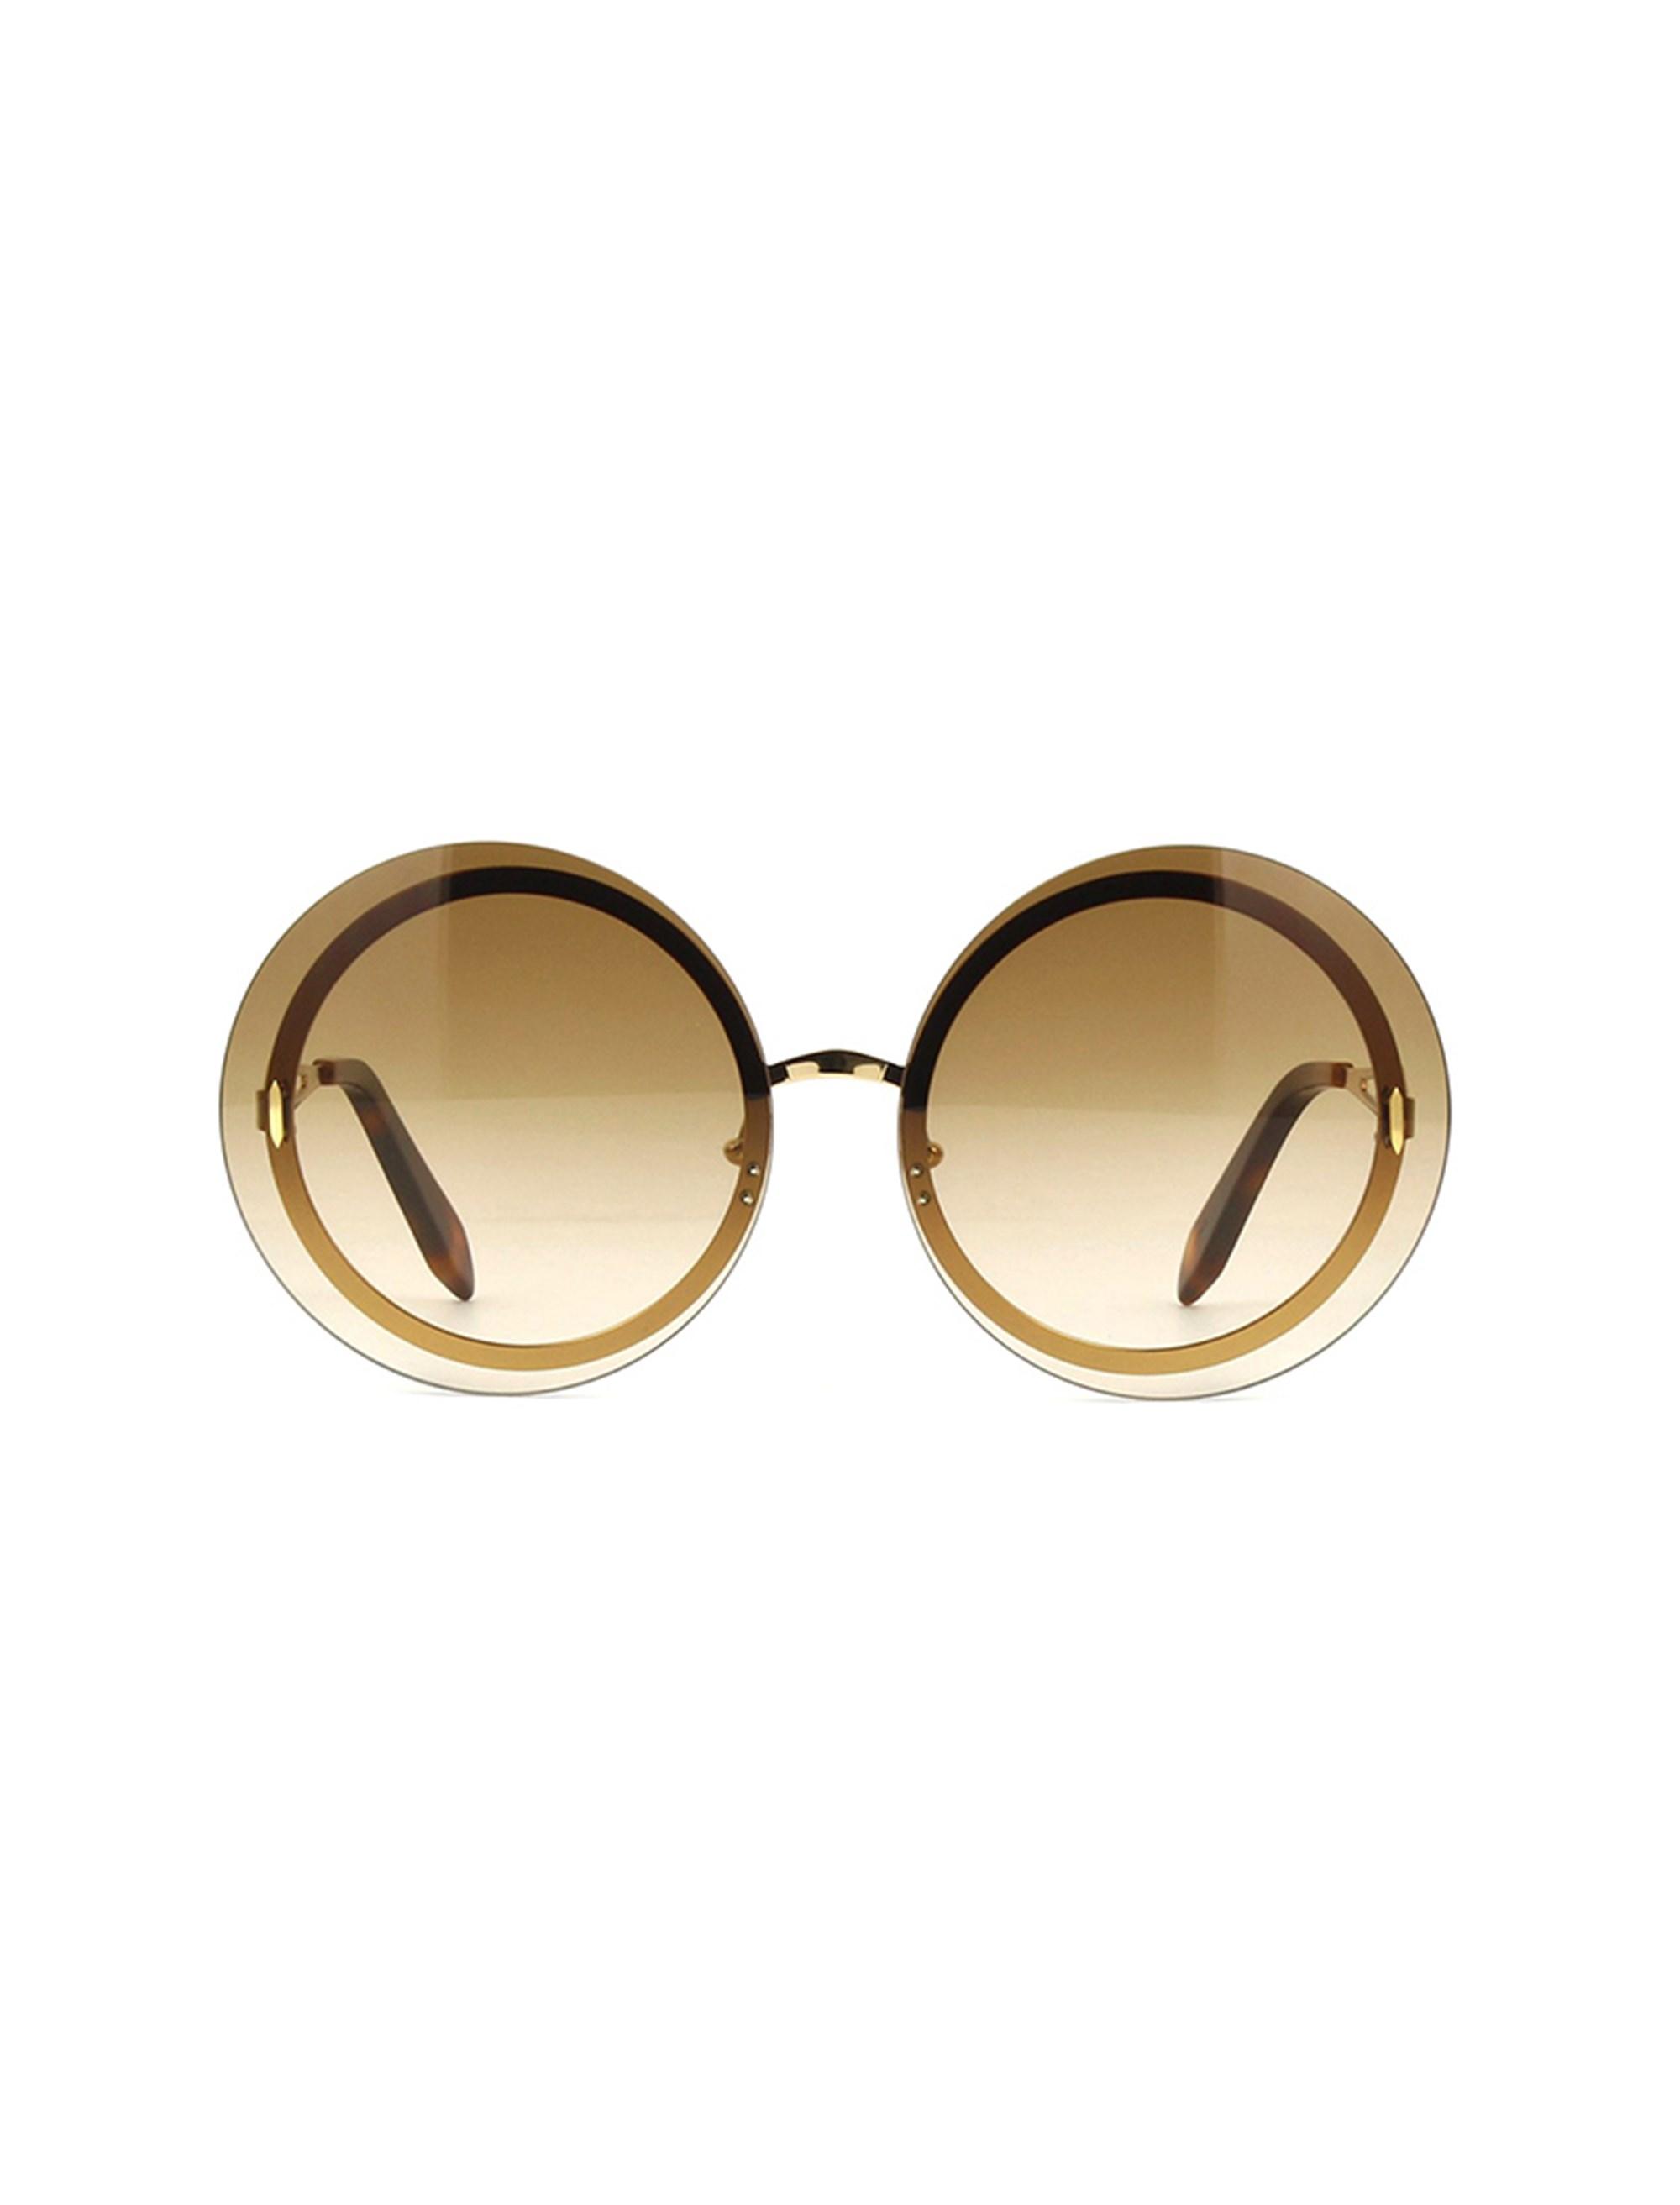 عینک آفتابی گرد زنانه - ویکتوریا بکهام